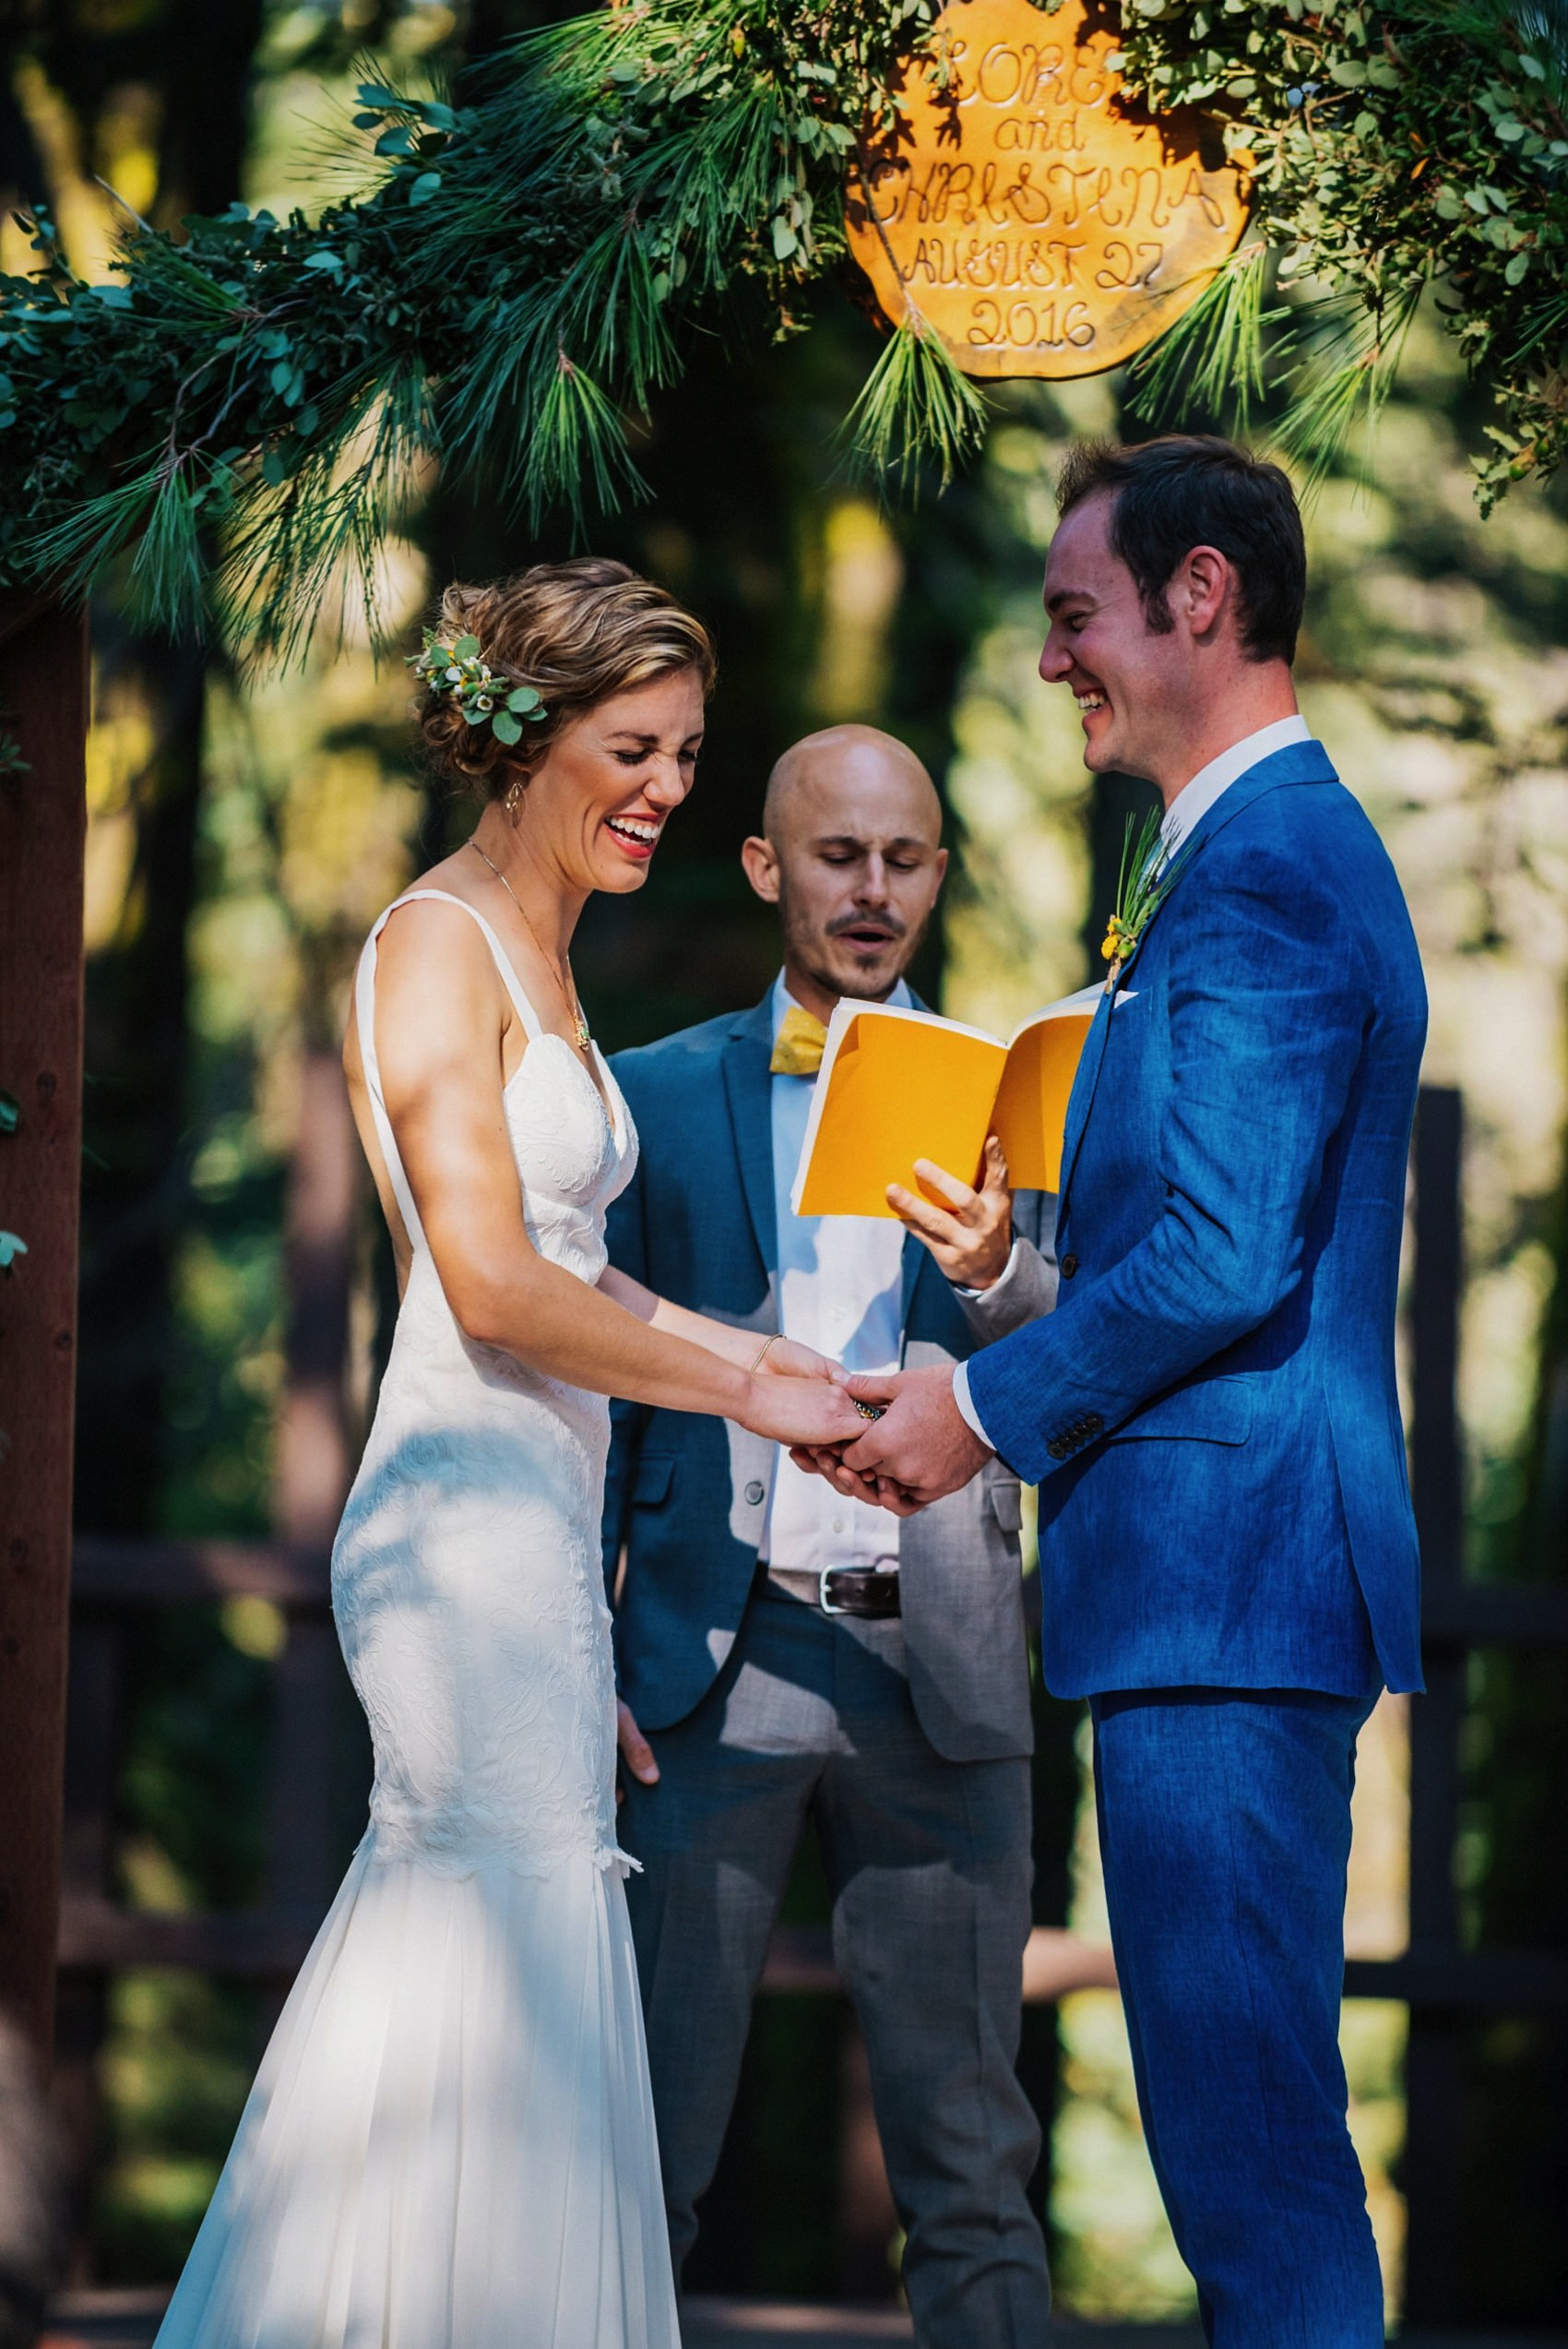 camp-shaffer-wedding-the-goodness-photo-137-photo.jpg